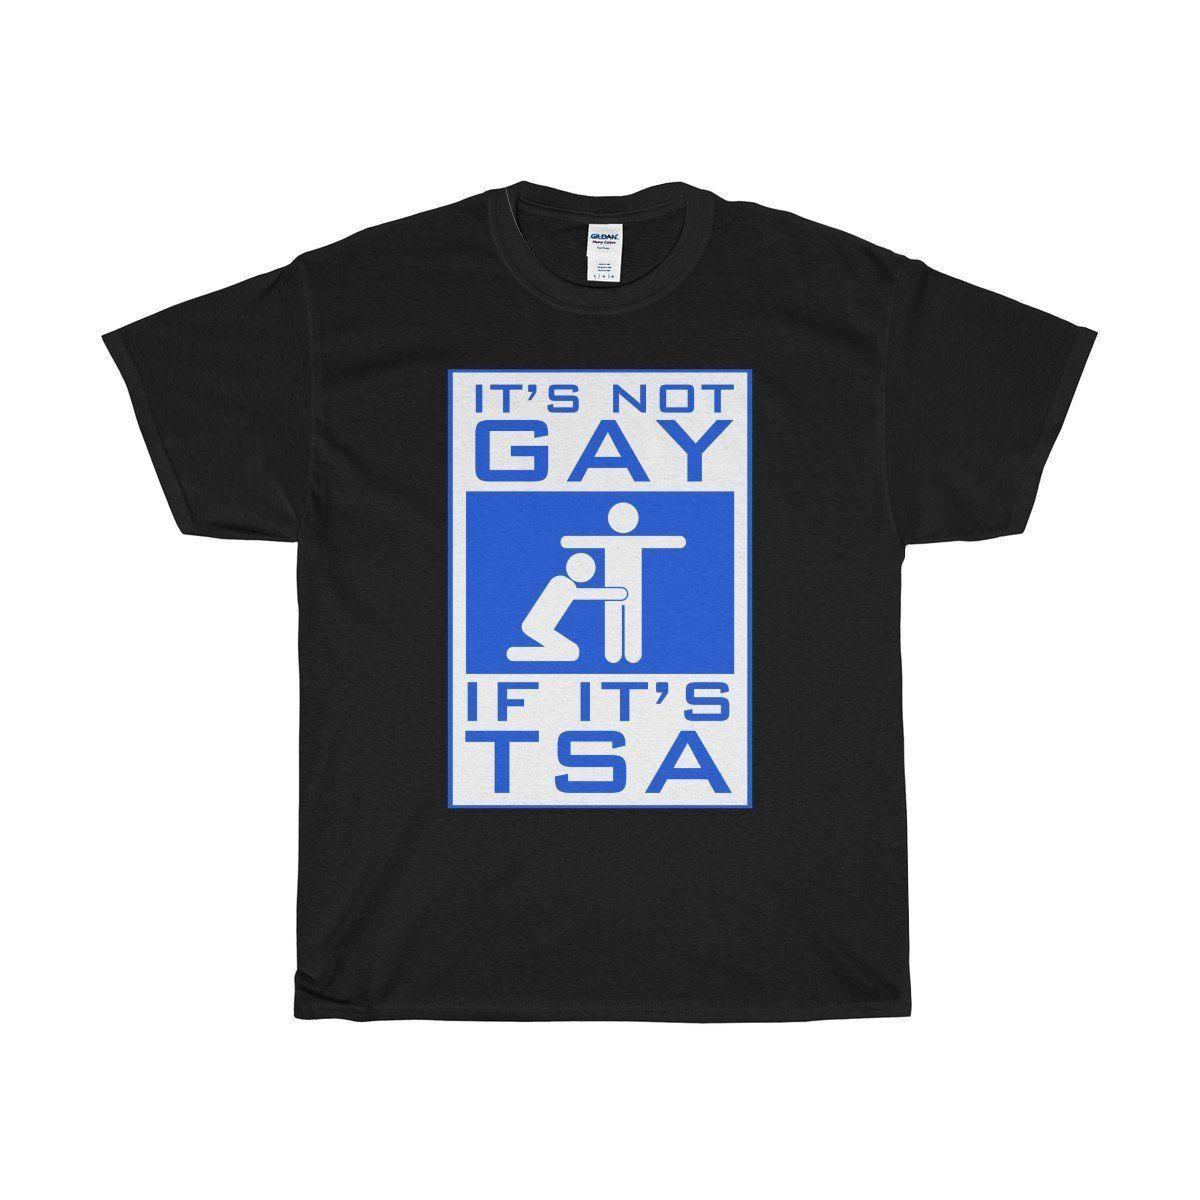 d824f3c723 It's not gay if it's TSA funny airport T-Shirt Unisex Heavy Cotton Tee  denim clothes camiseta t shirt